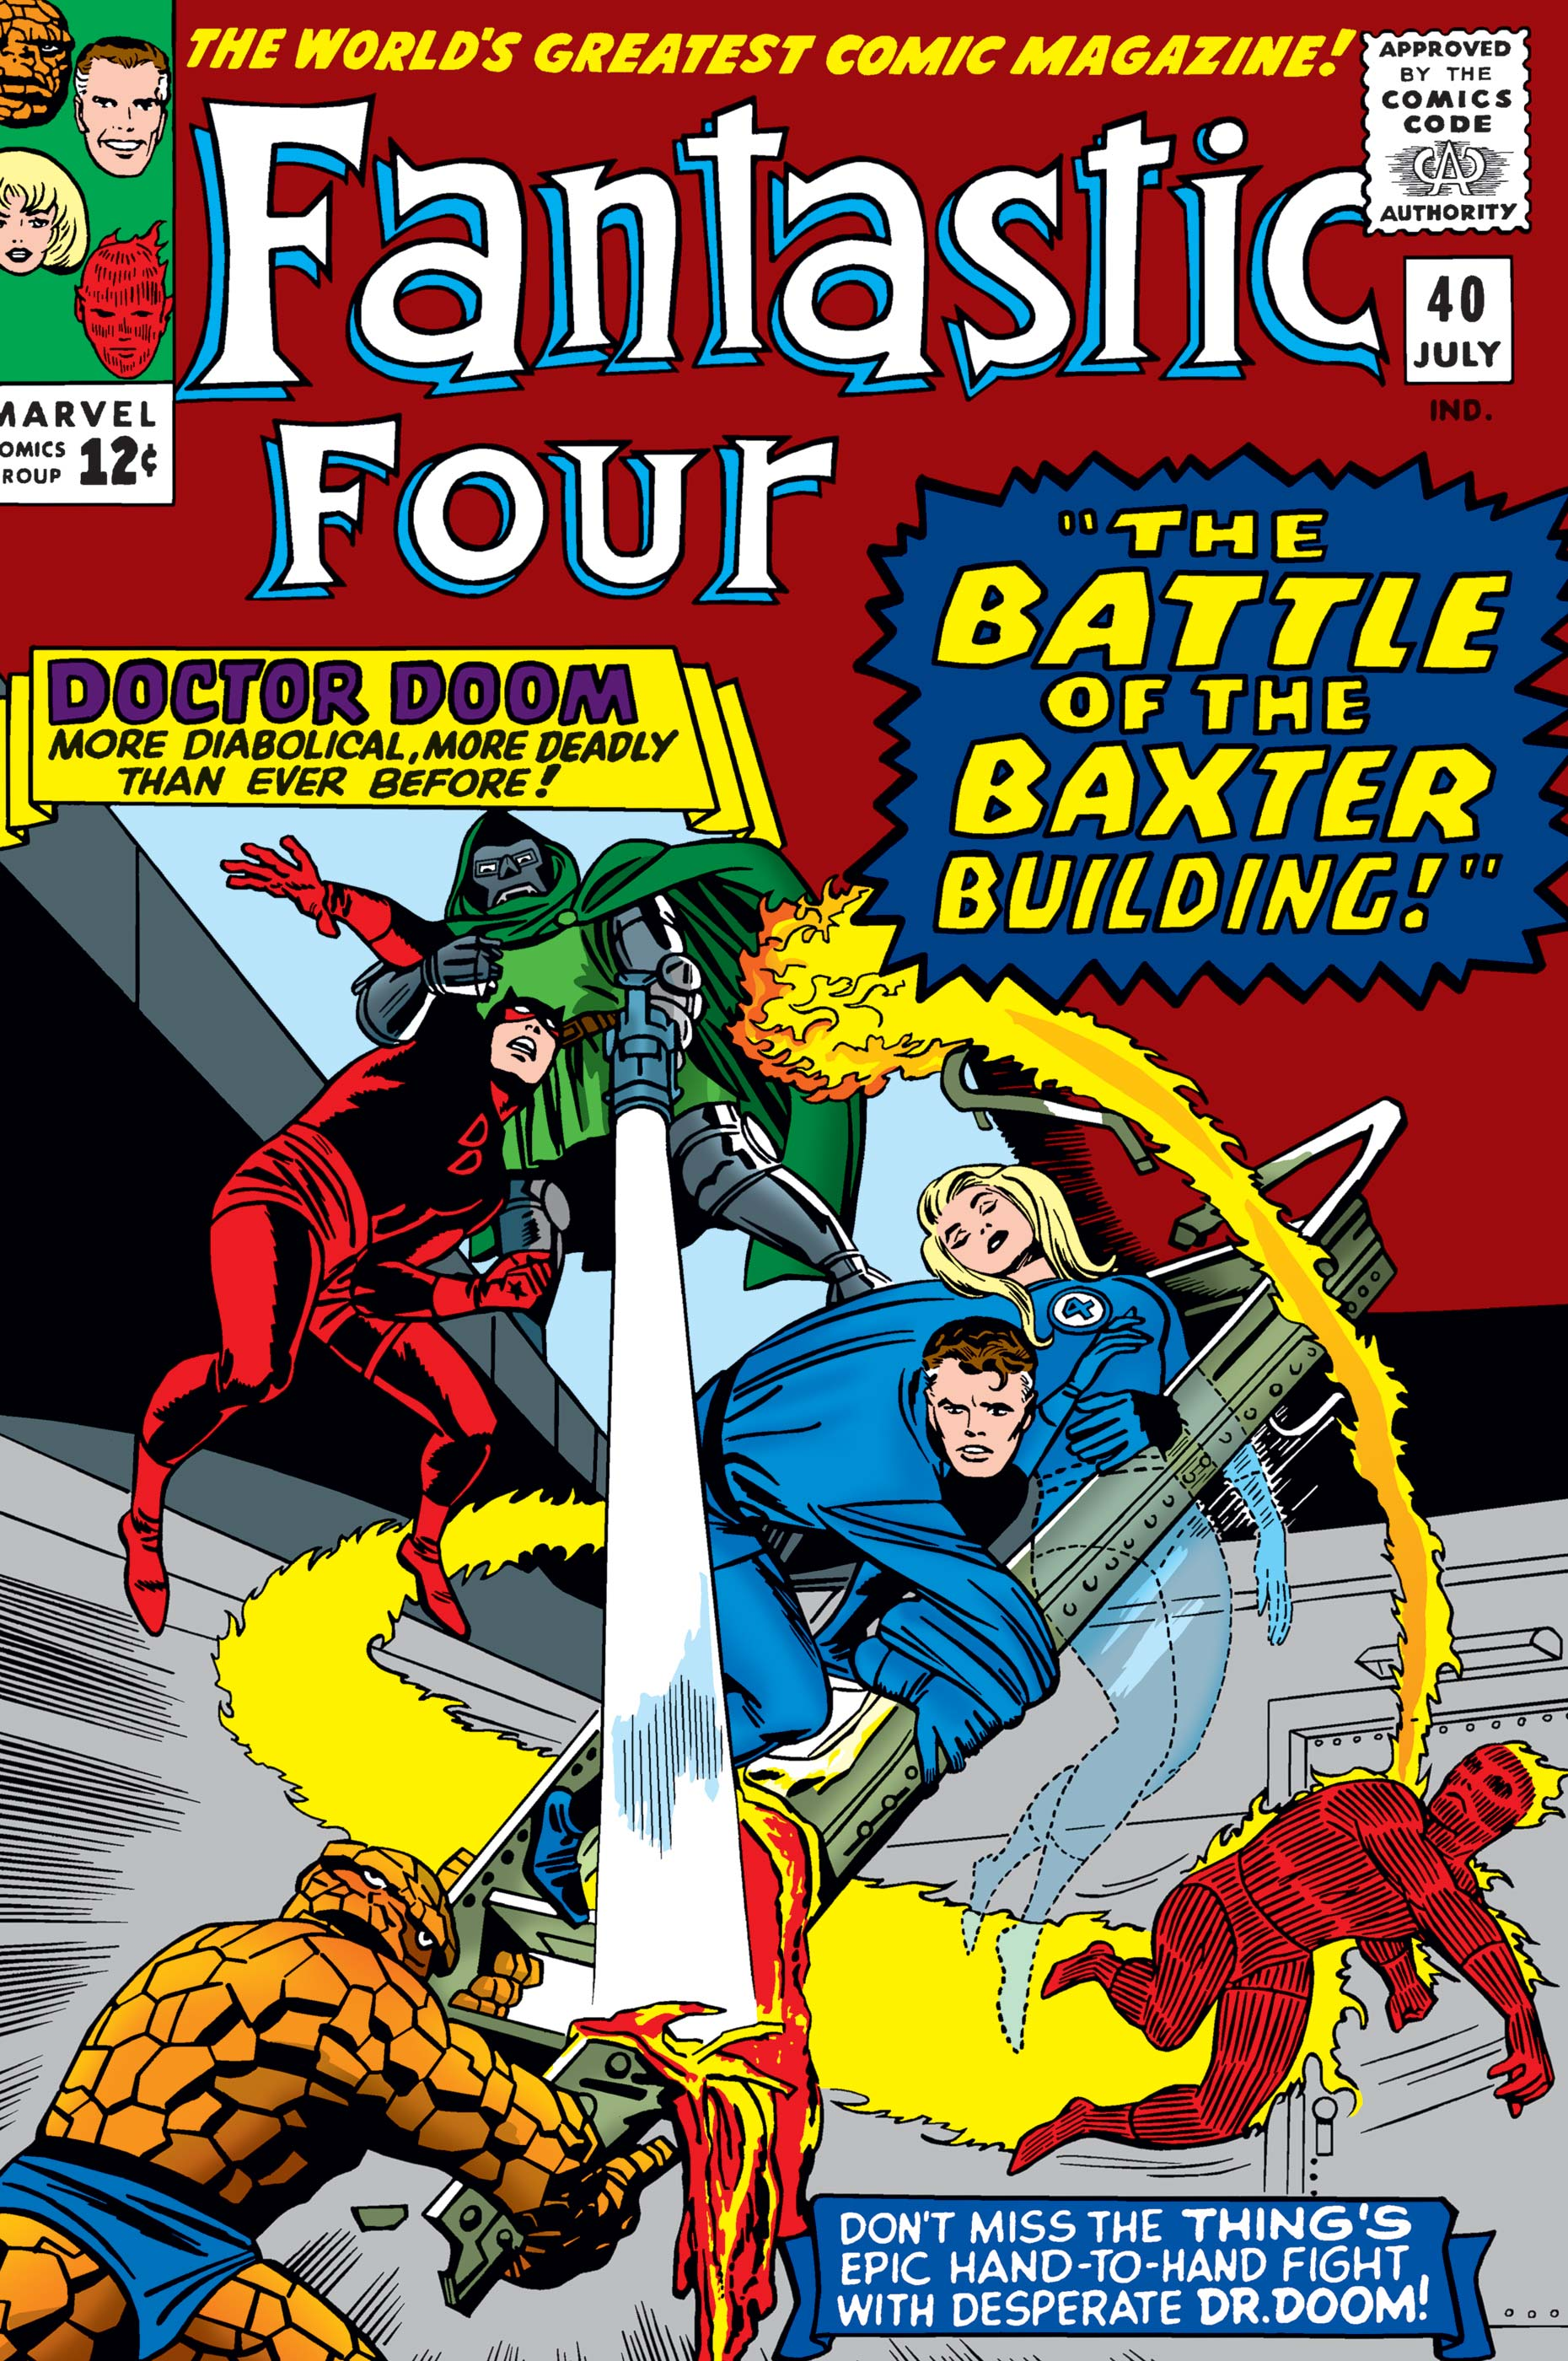 Fantastic Four (1961) #40